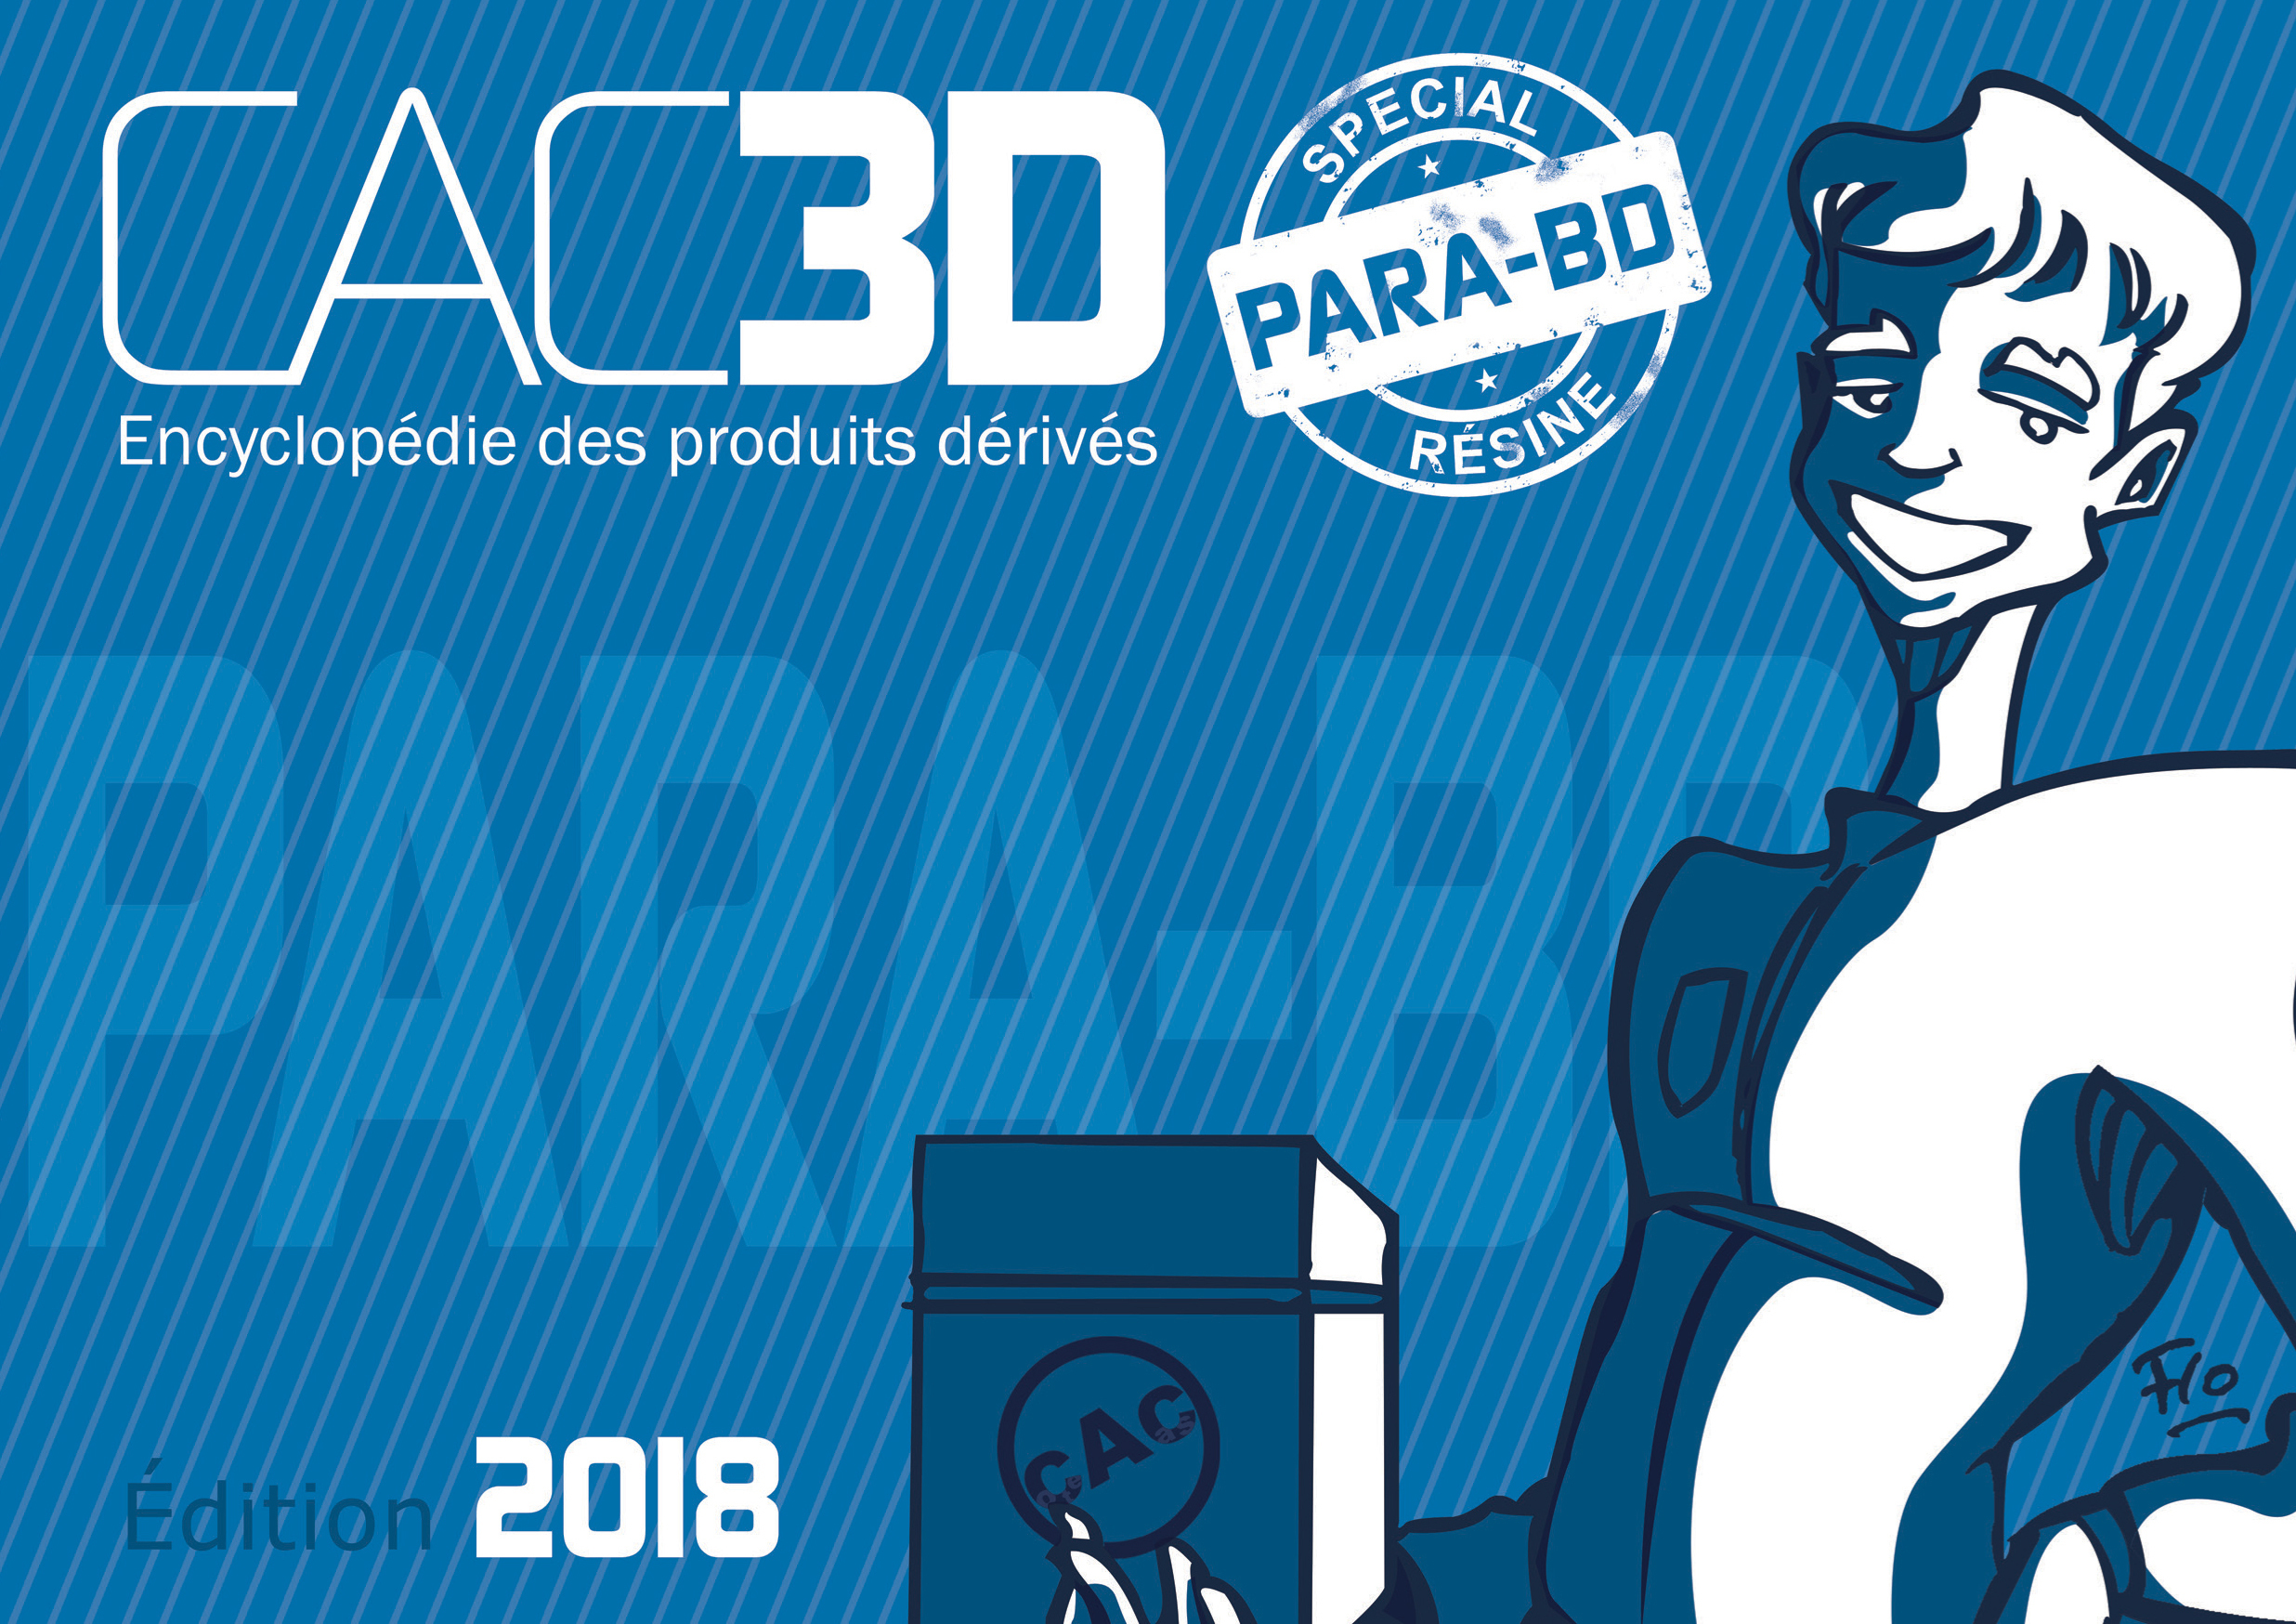 CAC3D PARA-BD RESINE 2018